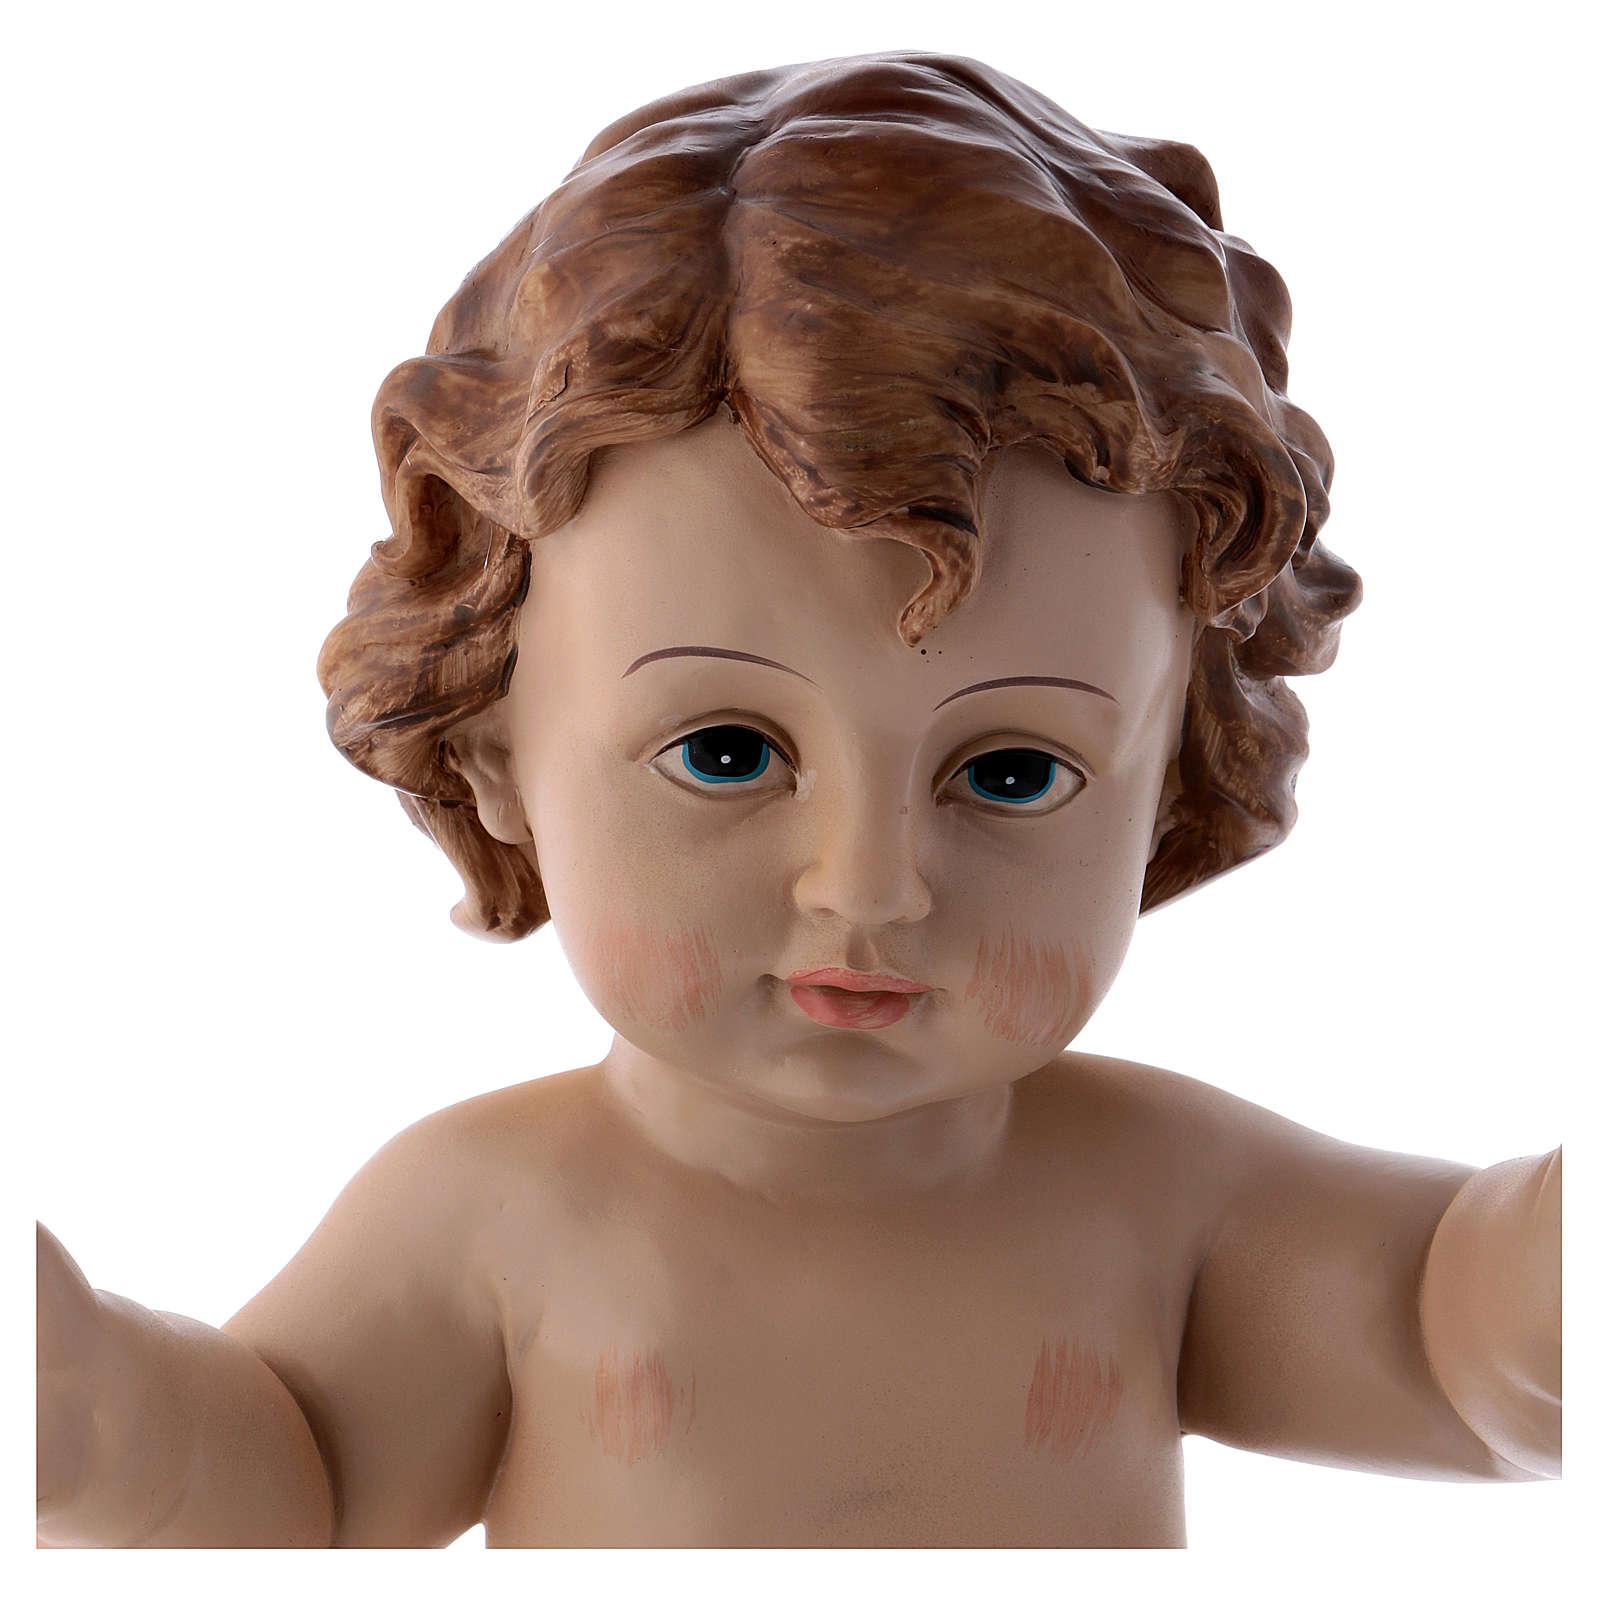 Resin baby Jesus statue, actual size 32 cm long 3